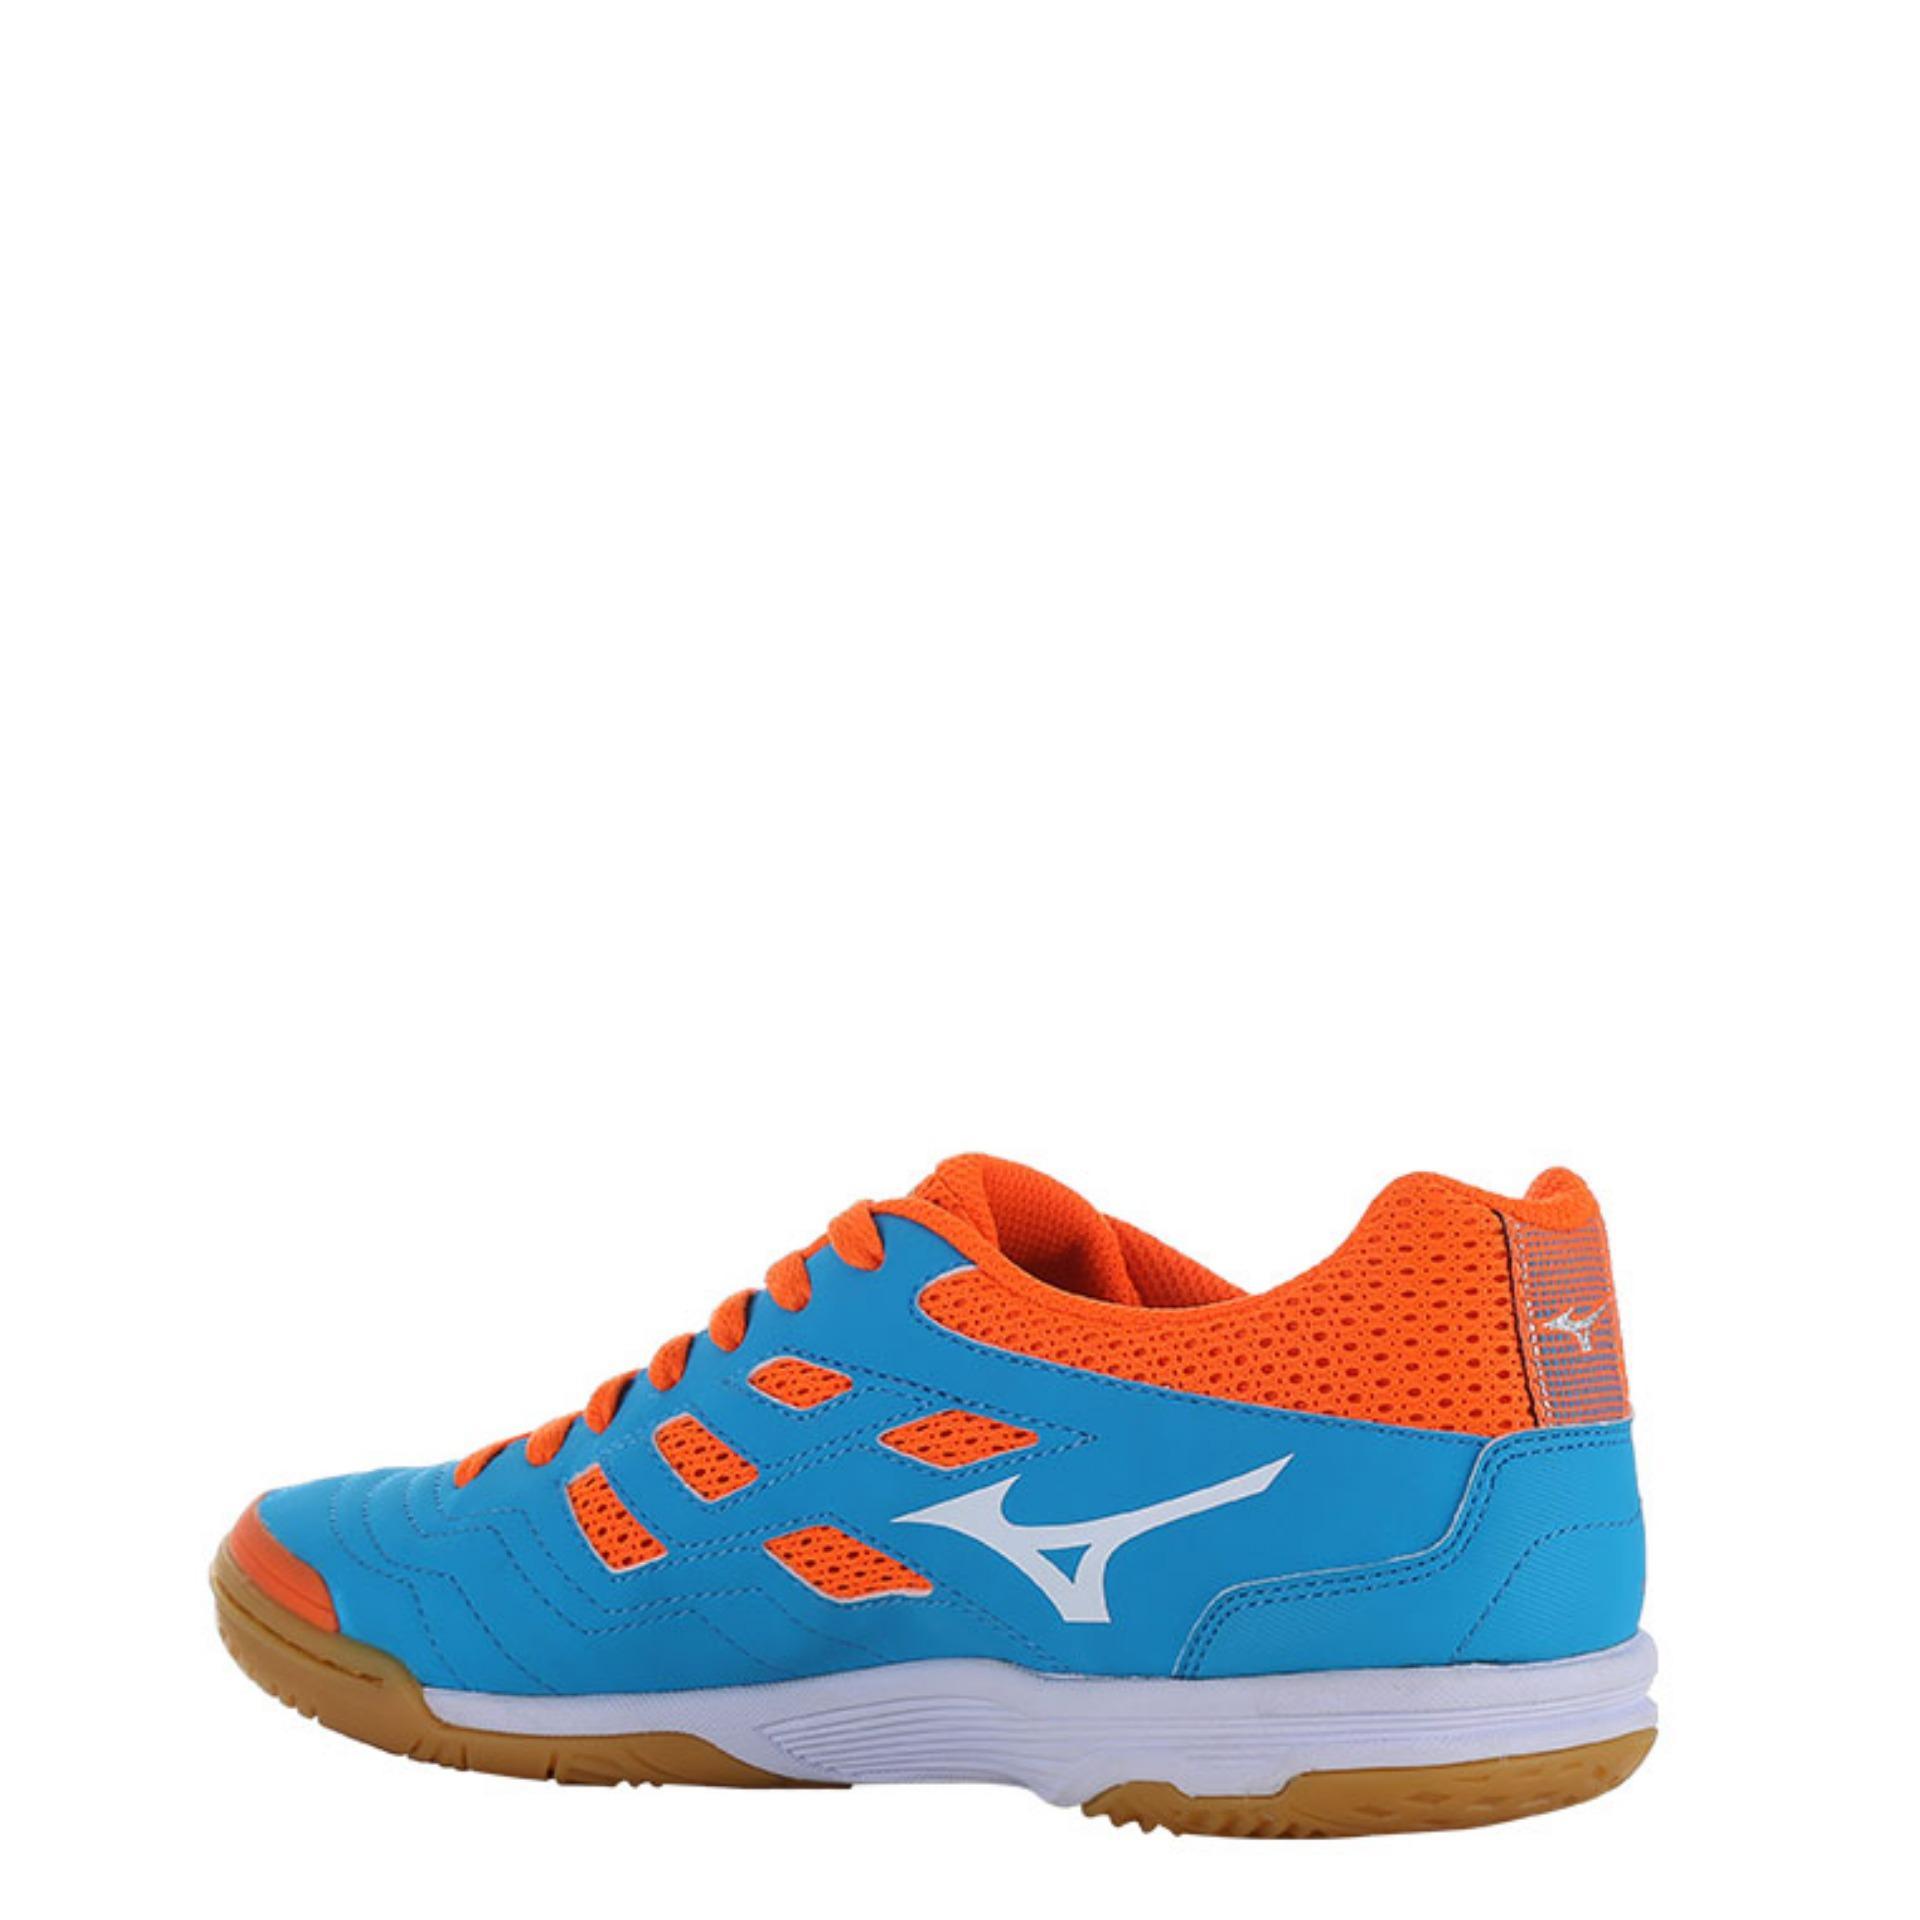 Cari Bandingkan Mizuno Sala Classic 2 In Atomic Blue White Orange Sepatu Futsal Yellow Crown Fish